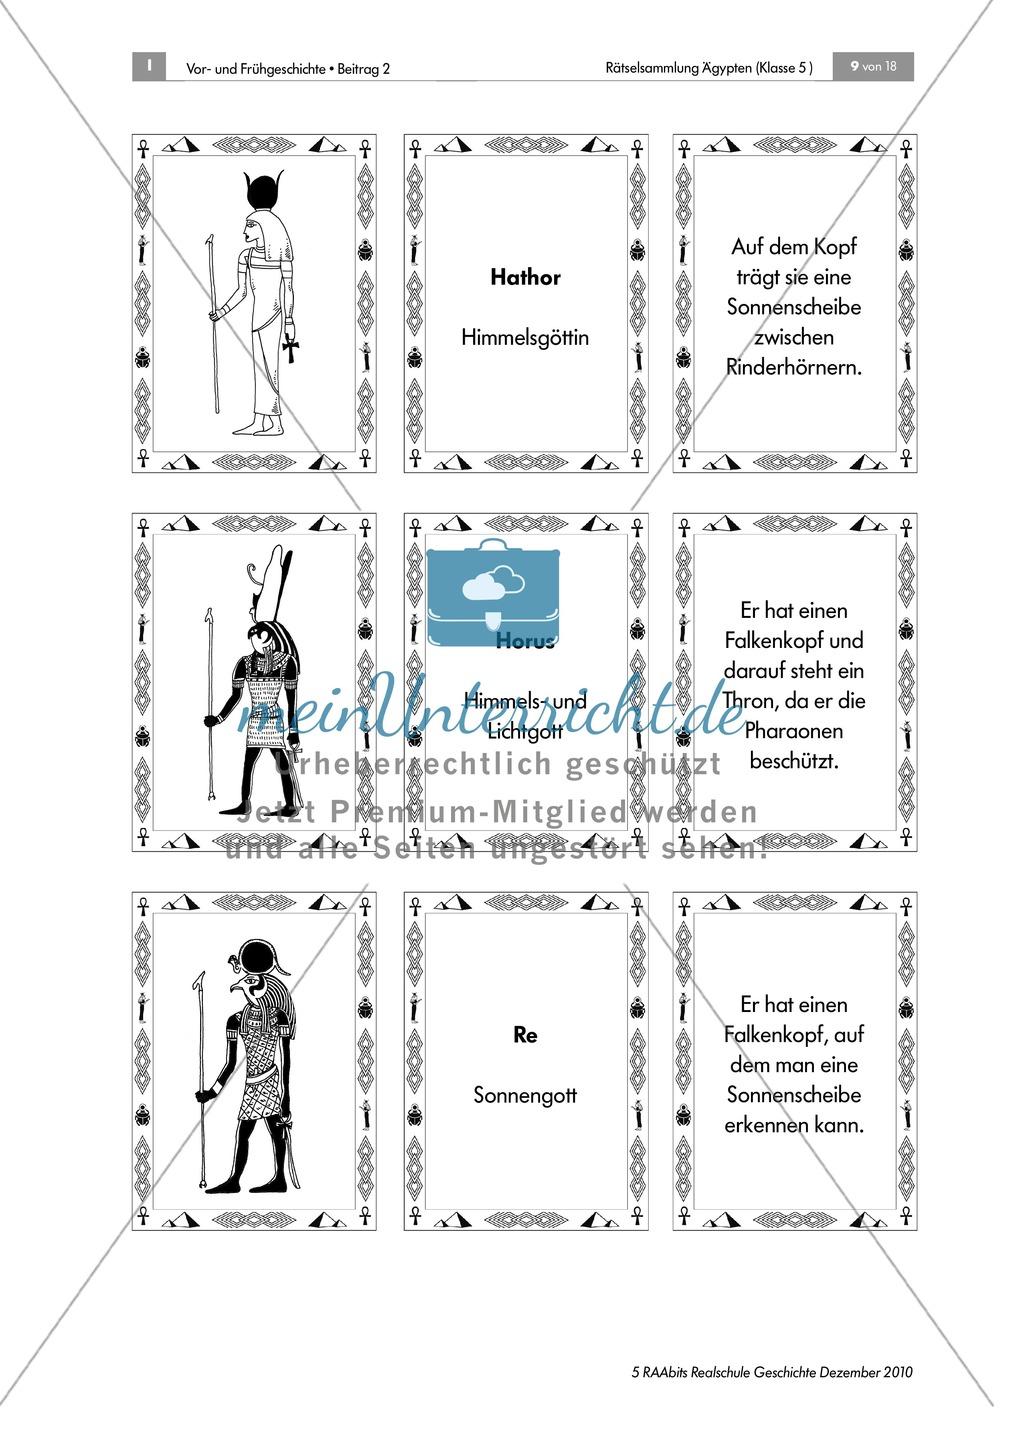 Rätselsammlung Ägypten: Im Götter-Tritett Namen, Attribute und Funktion der ägypt. Götter benennen Preview 2